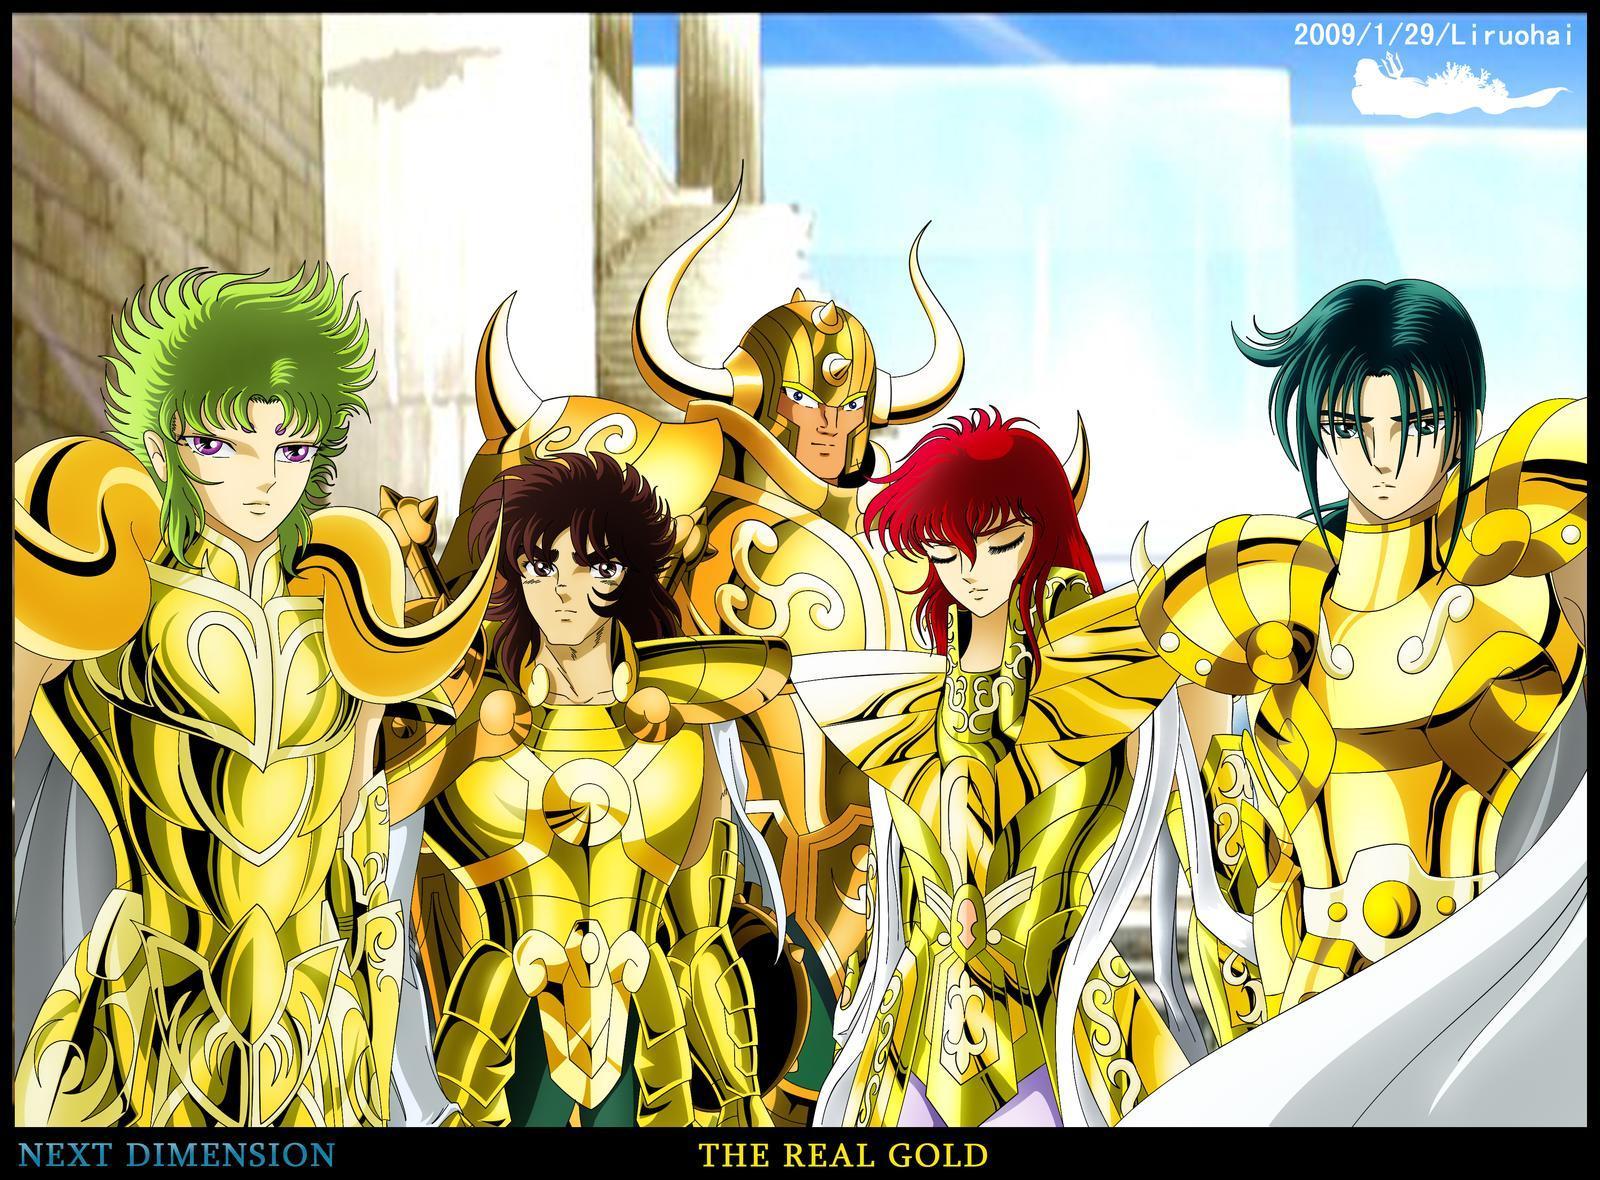 Saint Seiya - Next Dimension Manga COMPLETA %5BLiruohai%5D-Golds-Next-Dimension